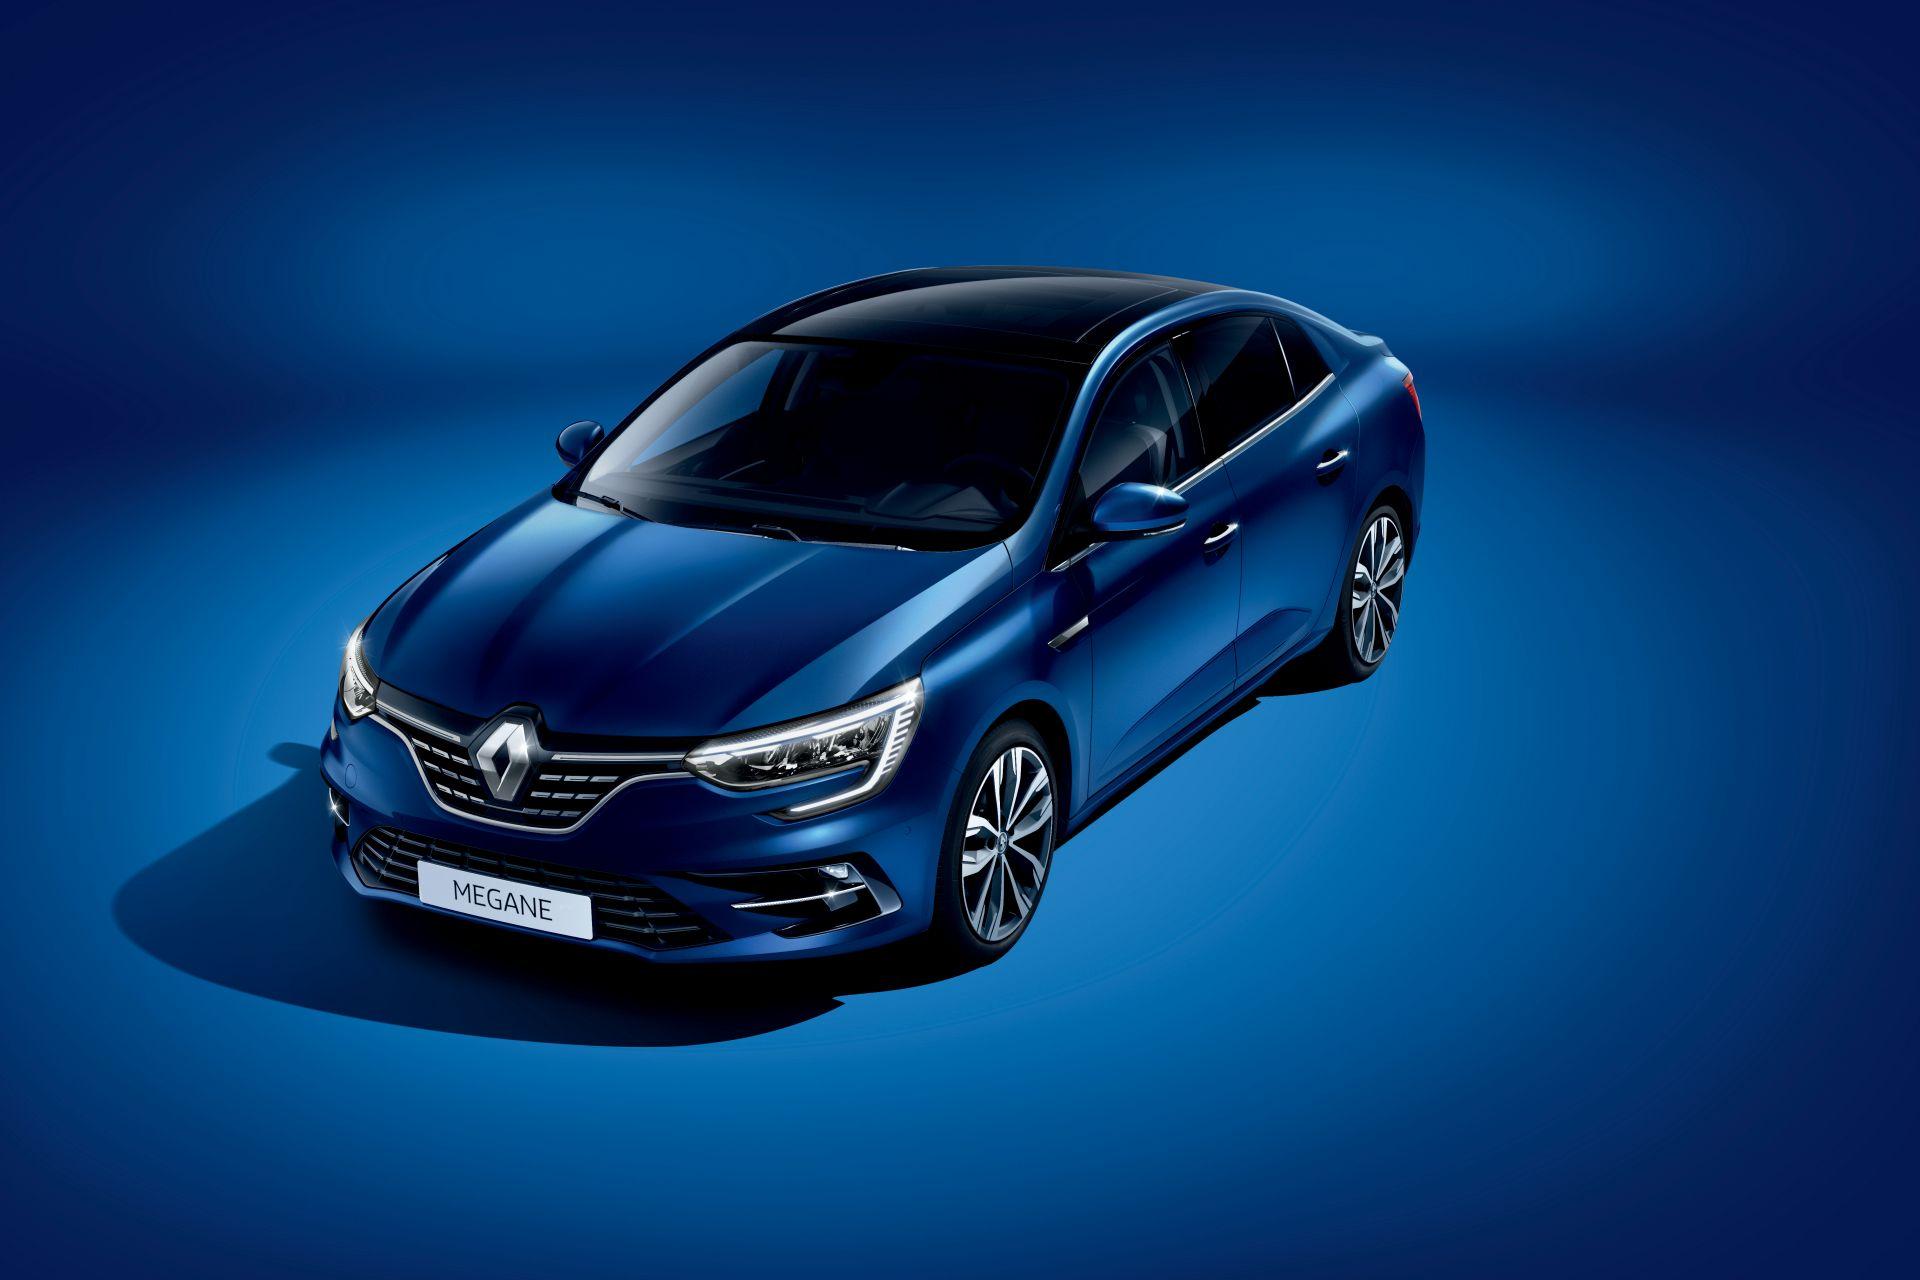 2021 Renault Megane Sedan Facelift 15